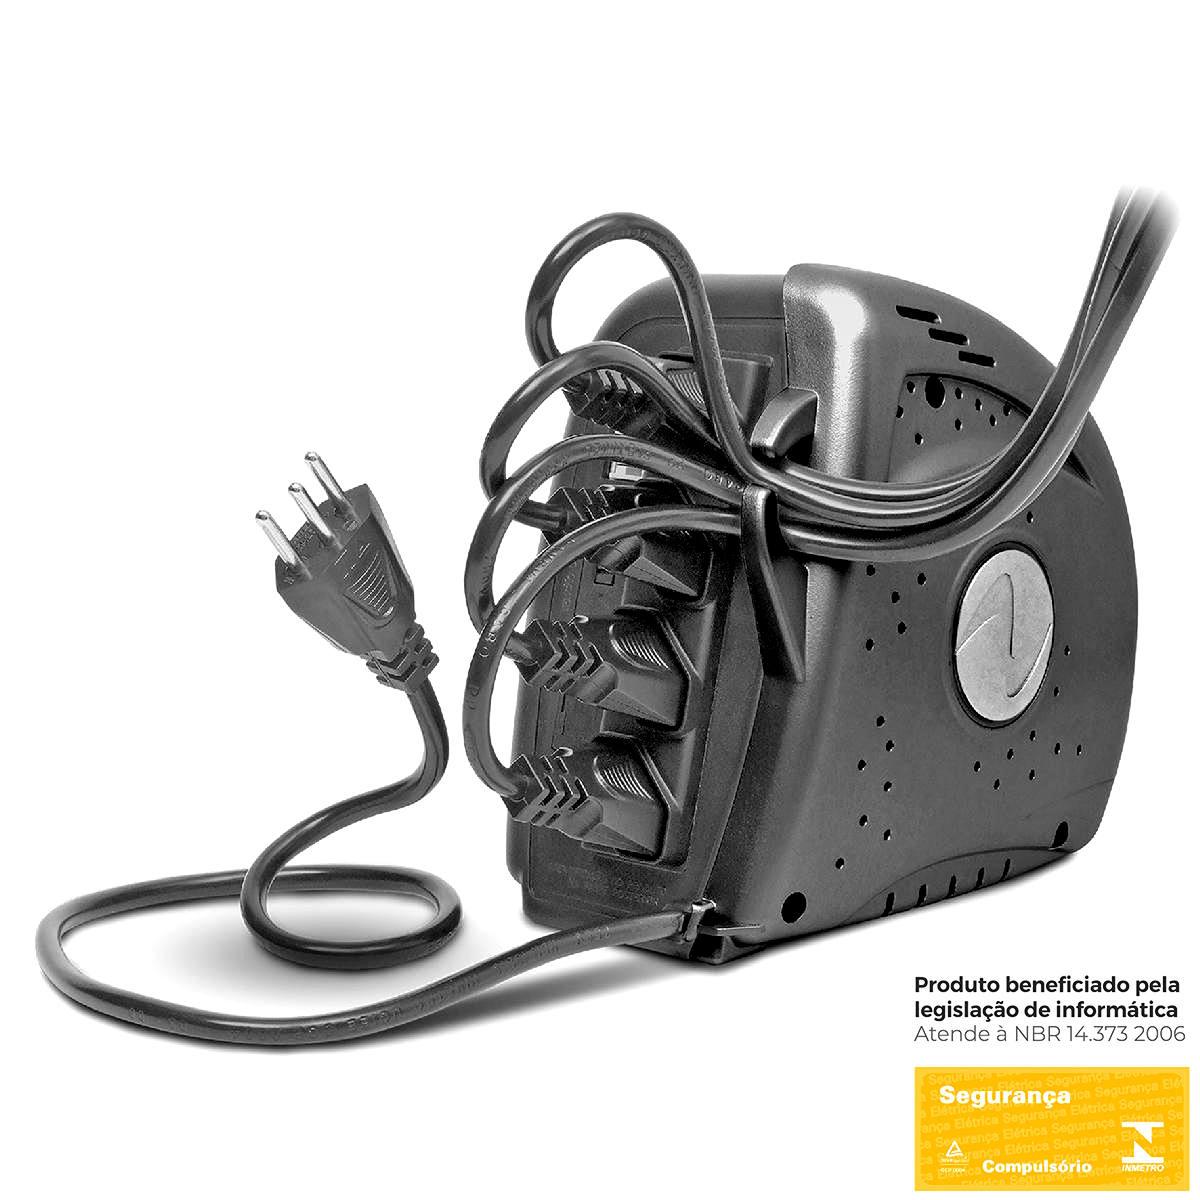 Estabilizador 300VA 300W Bivolt 4 Tomadas Proteção contra Sobrecarga Curto Circuito Sobretemperatura Ragtech 5303